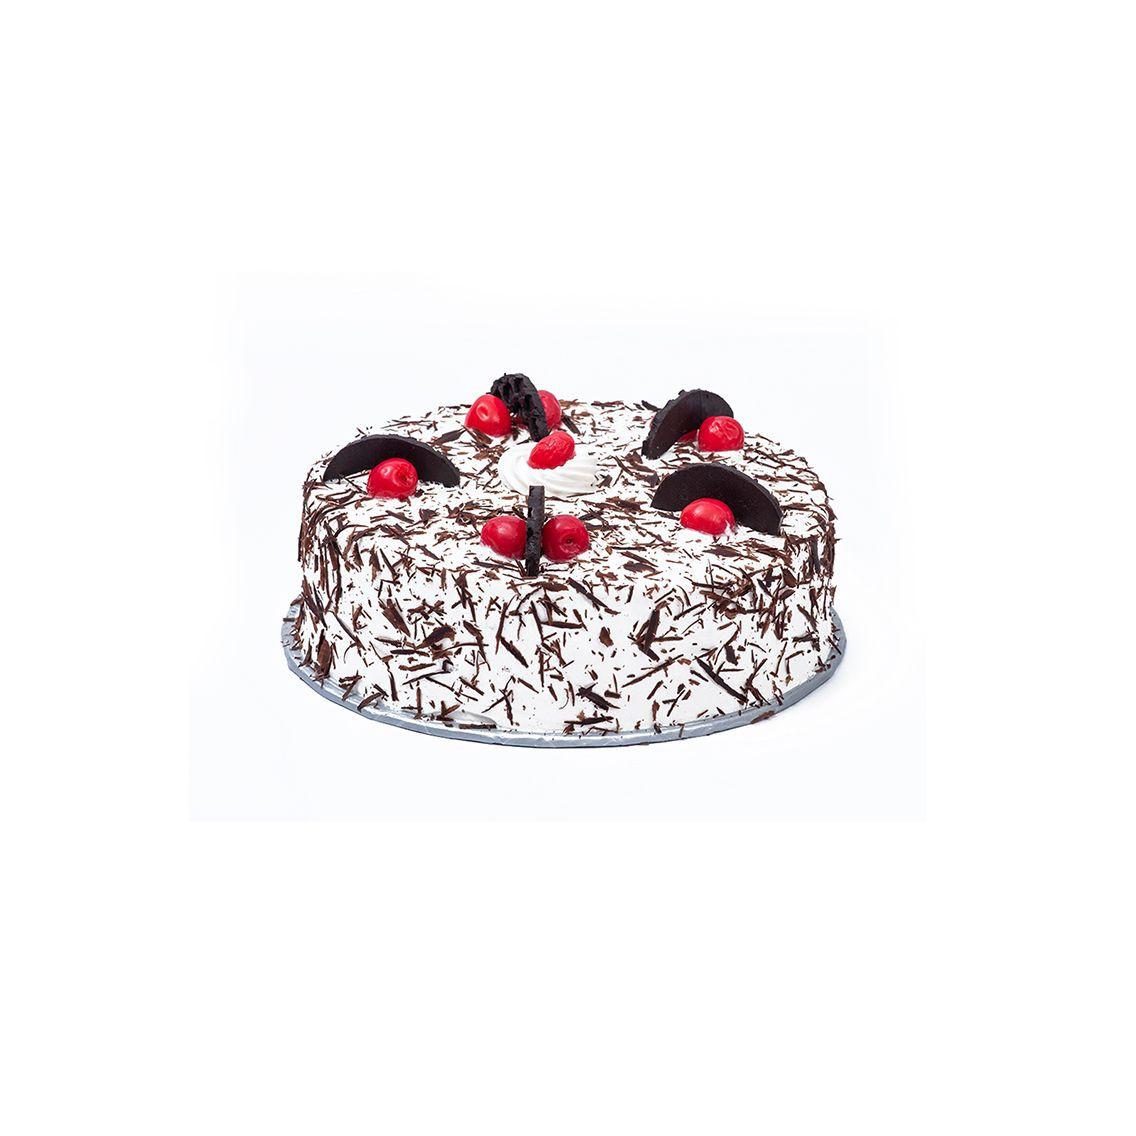 Kitchen Cuisine Default Category Black Forest Cake